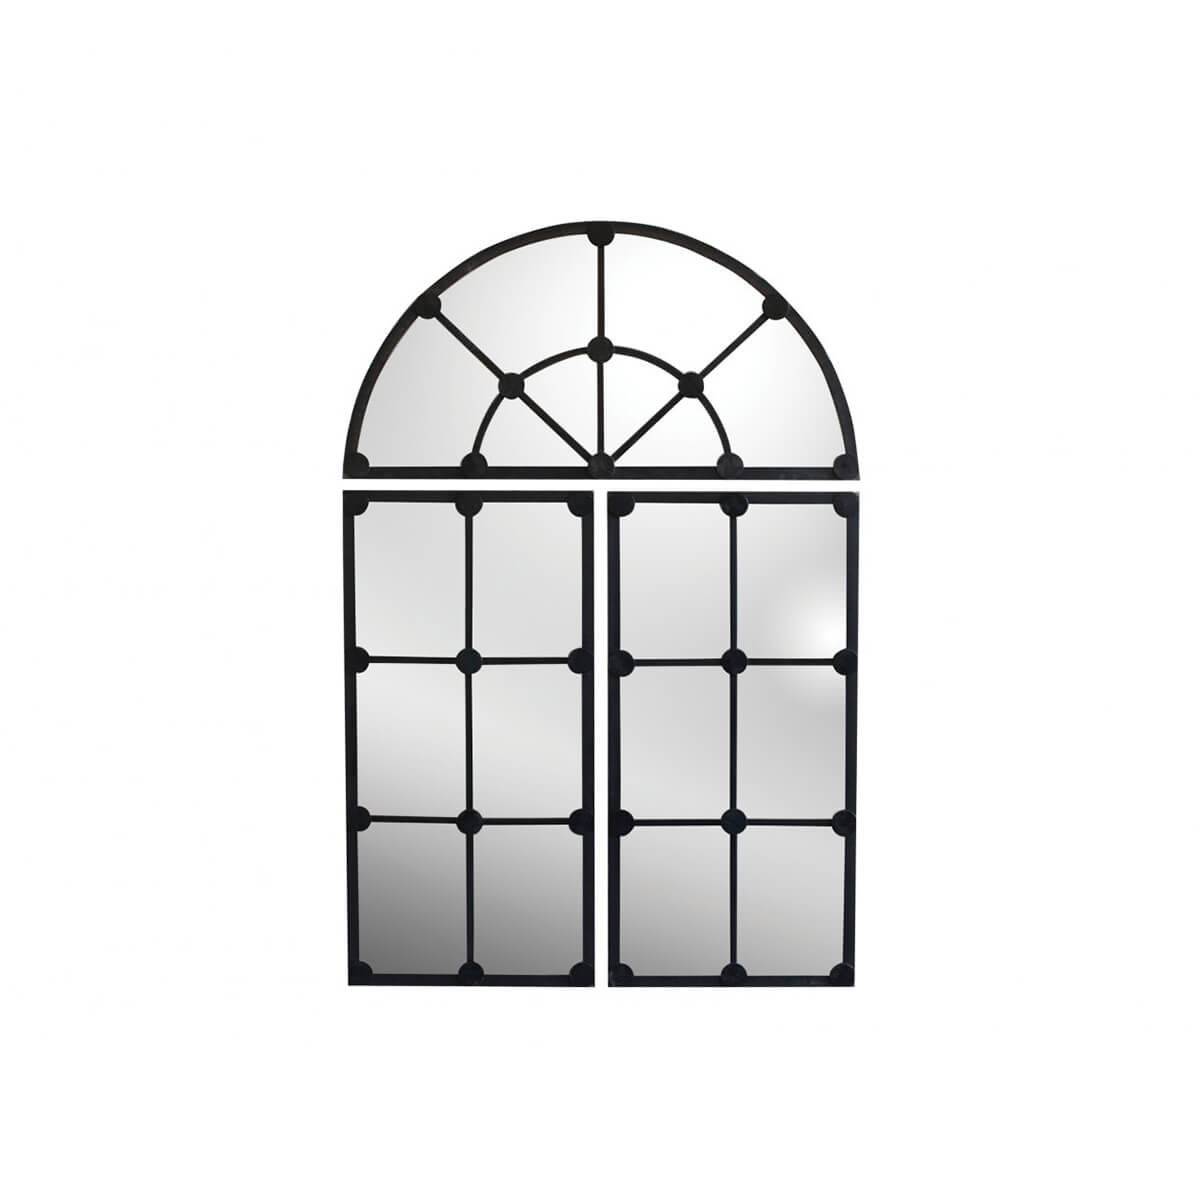 Conservatory-Window-Mirror-Small-CozyHome-Dubai